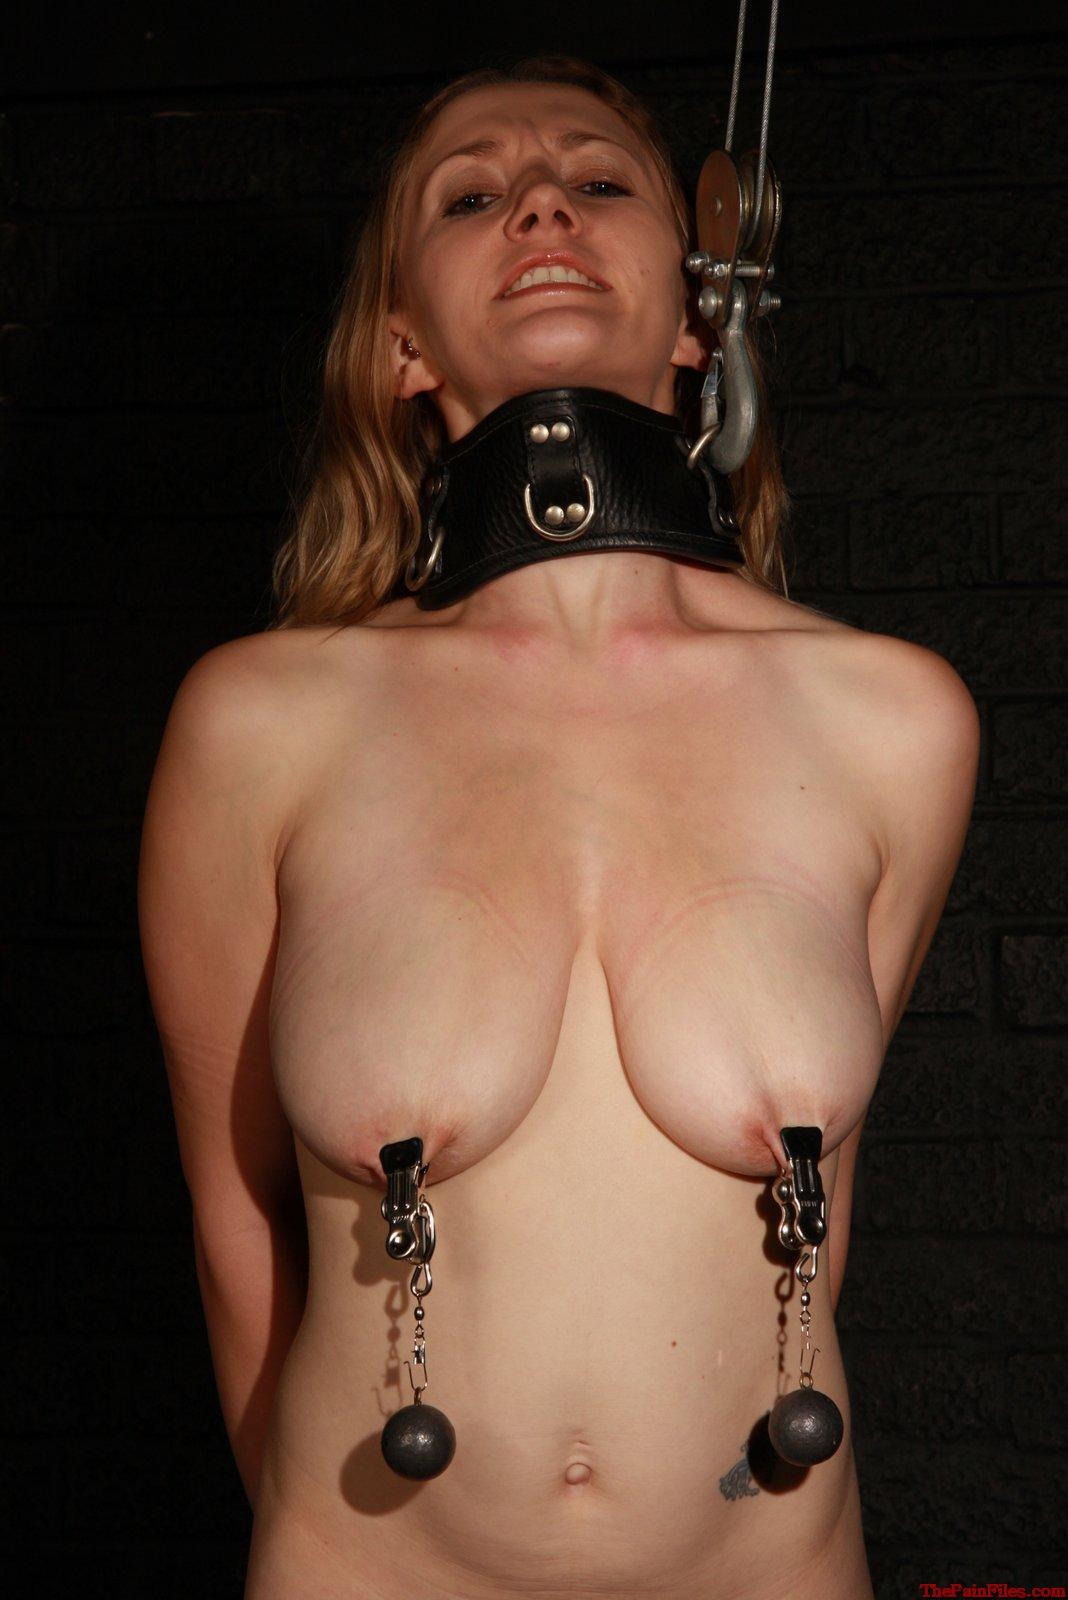 Asian mei mara brutal bdsm slave training and rough tit tort - 1 part 4